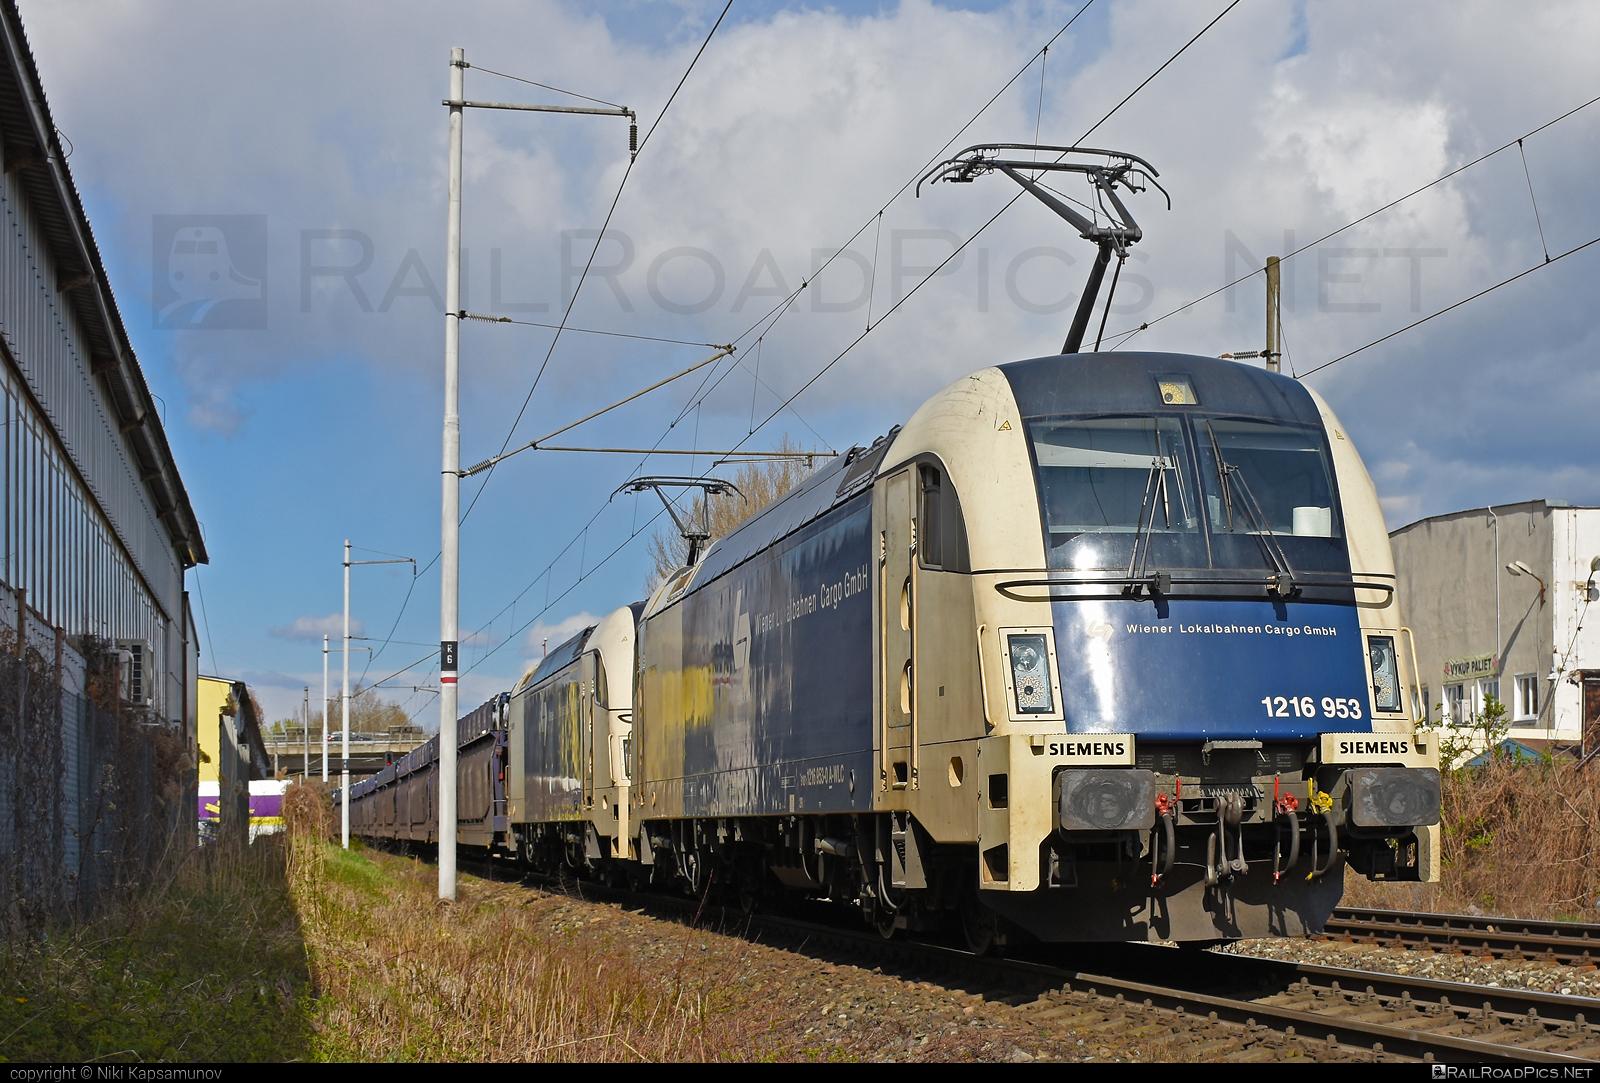 Siemens ES 64 U4 - 1216 953 operated by Wiener Lokalbahnen Cargo GmbH #carcarrierwagon #es64 #es64u #es64u4 #eurosprinter #siemens #siemenses64 #siemenses64u #siemenses64u4 #siemenstaurus #taurus #tauruslocomotive #wienerlokalbahnencargo #wienerlokalbahnencargogmbh #wlc